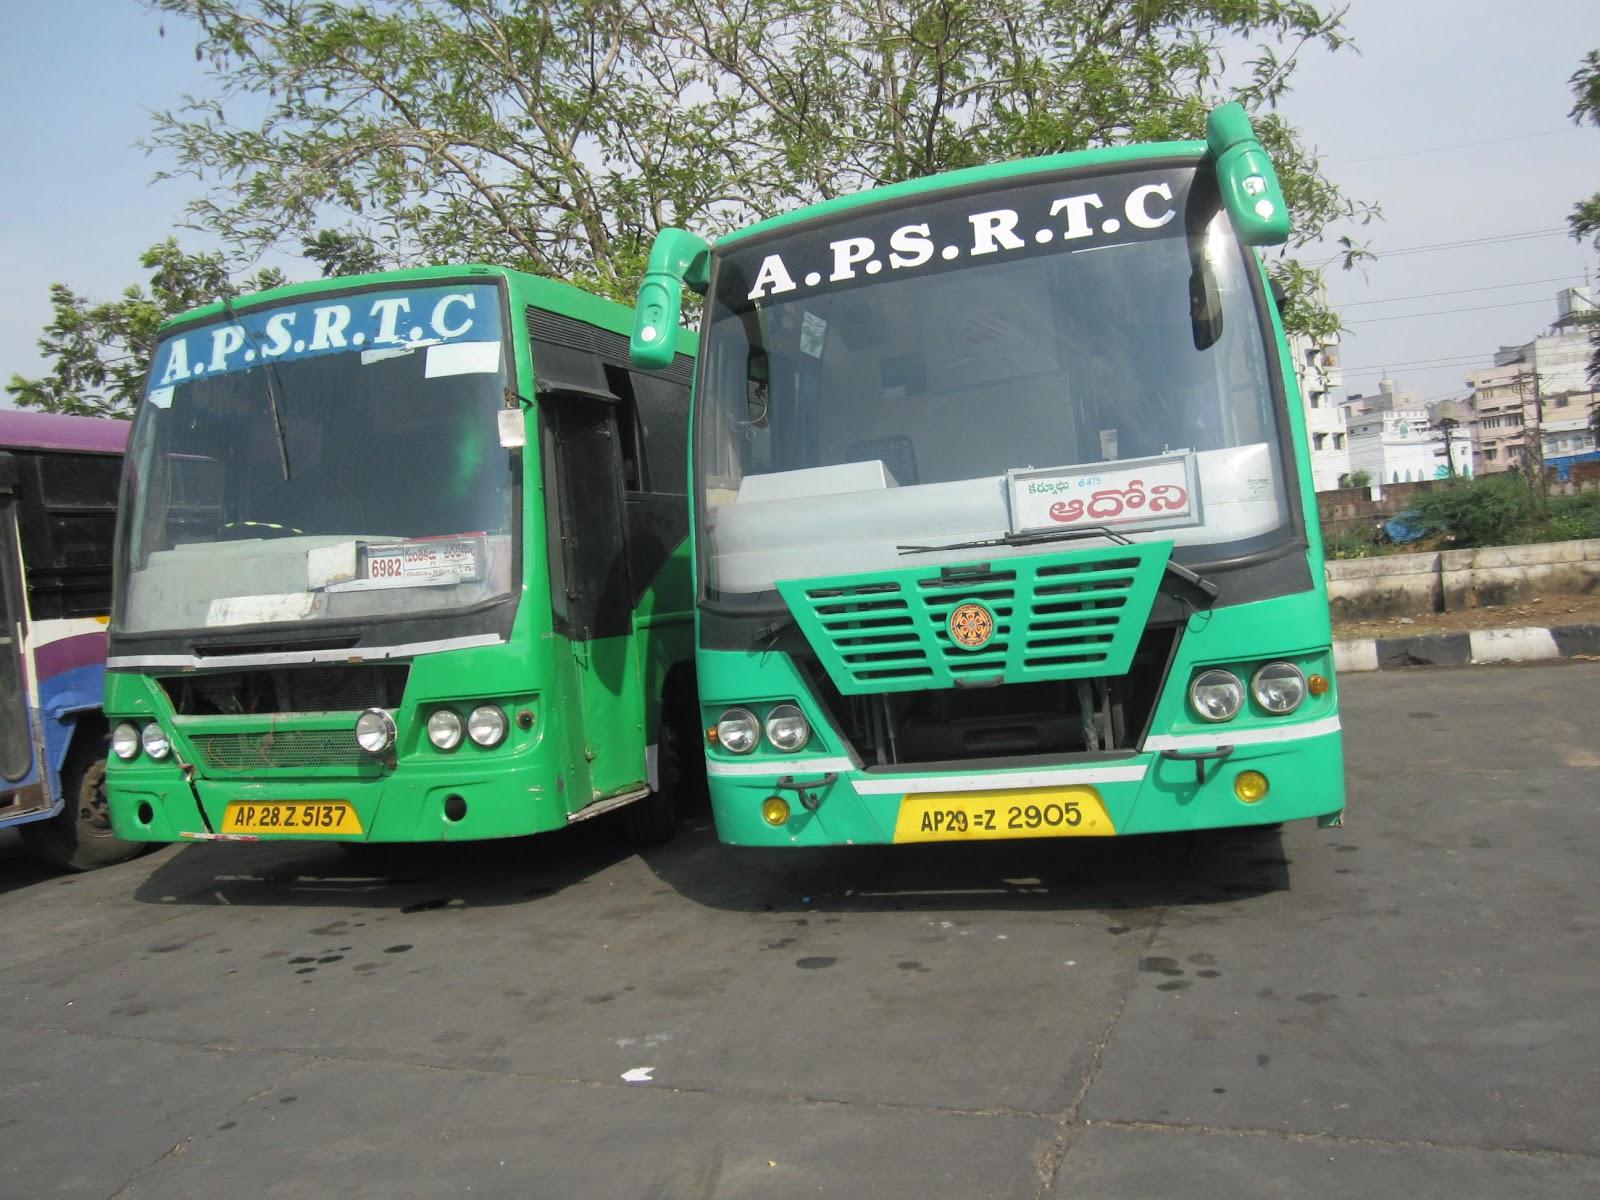 A P S R T C Fans Travellogue Hyderabad Nizamabad Nagpur